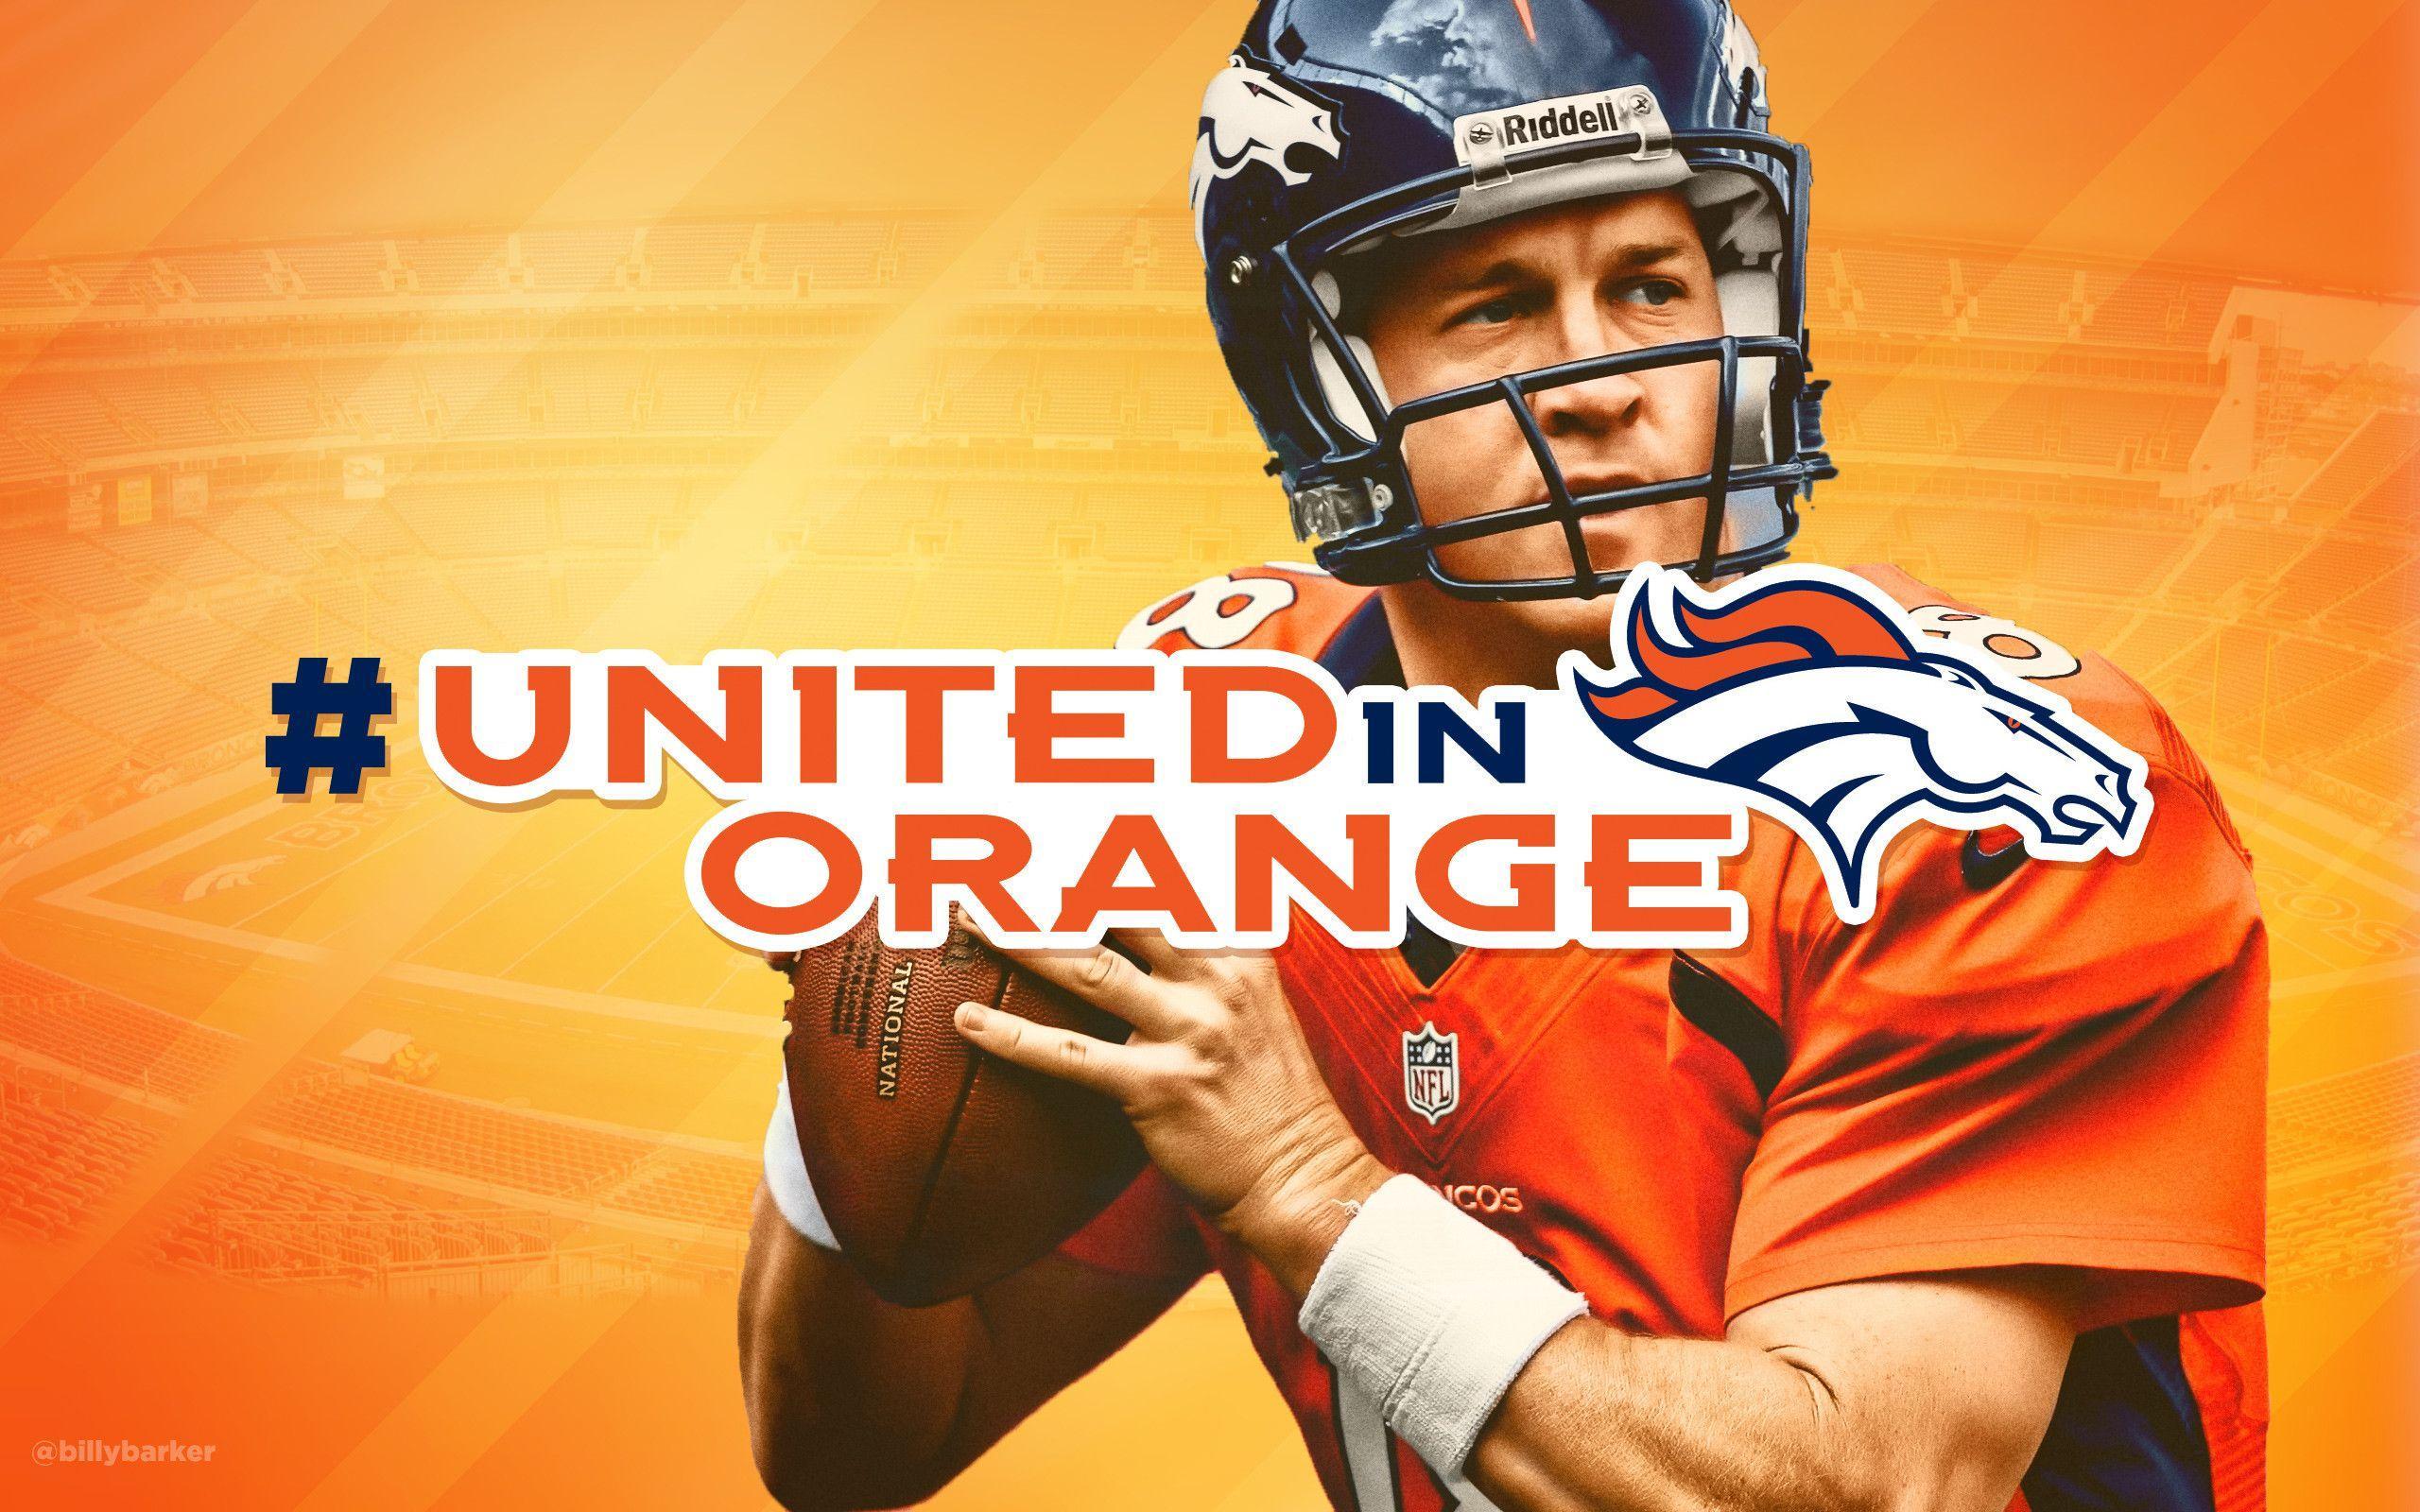 Citroenax 2017 | Images: <b>Denver Broncos</b> Wallpaper For Ipad | Free ...